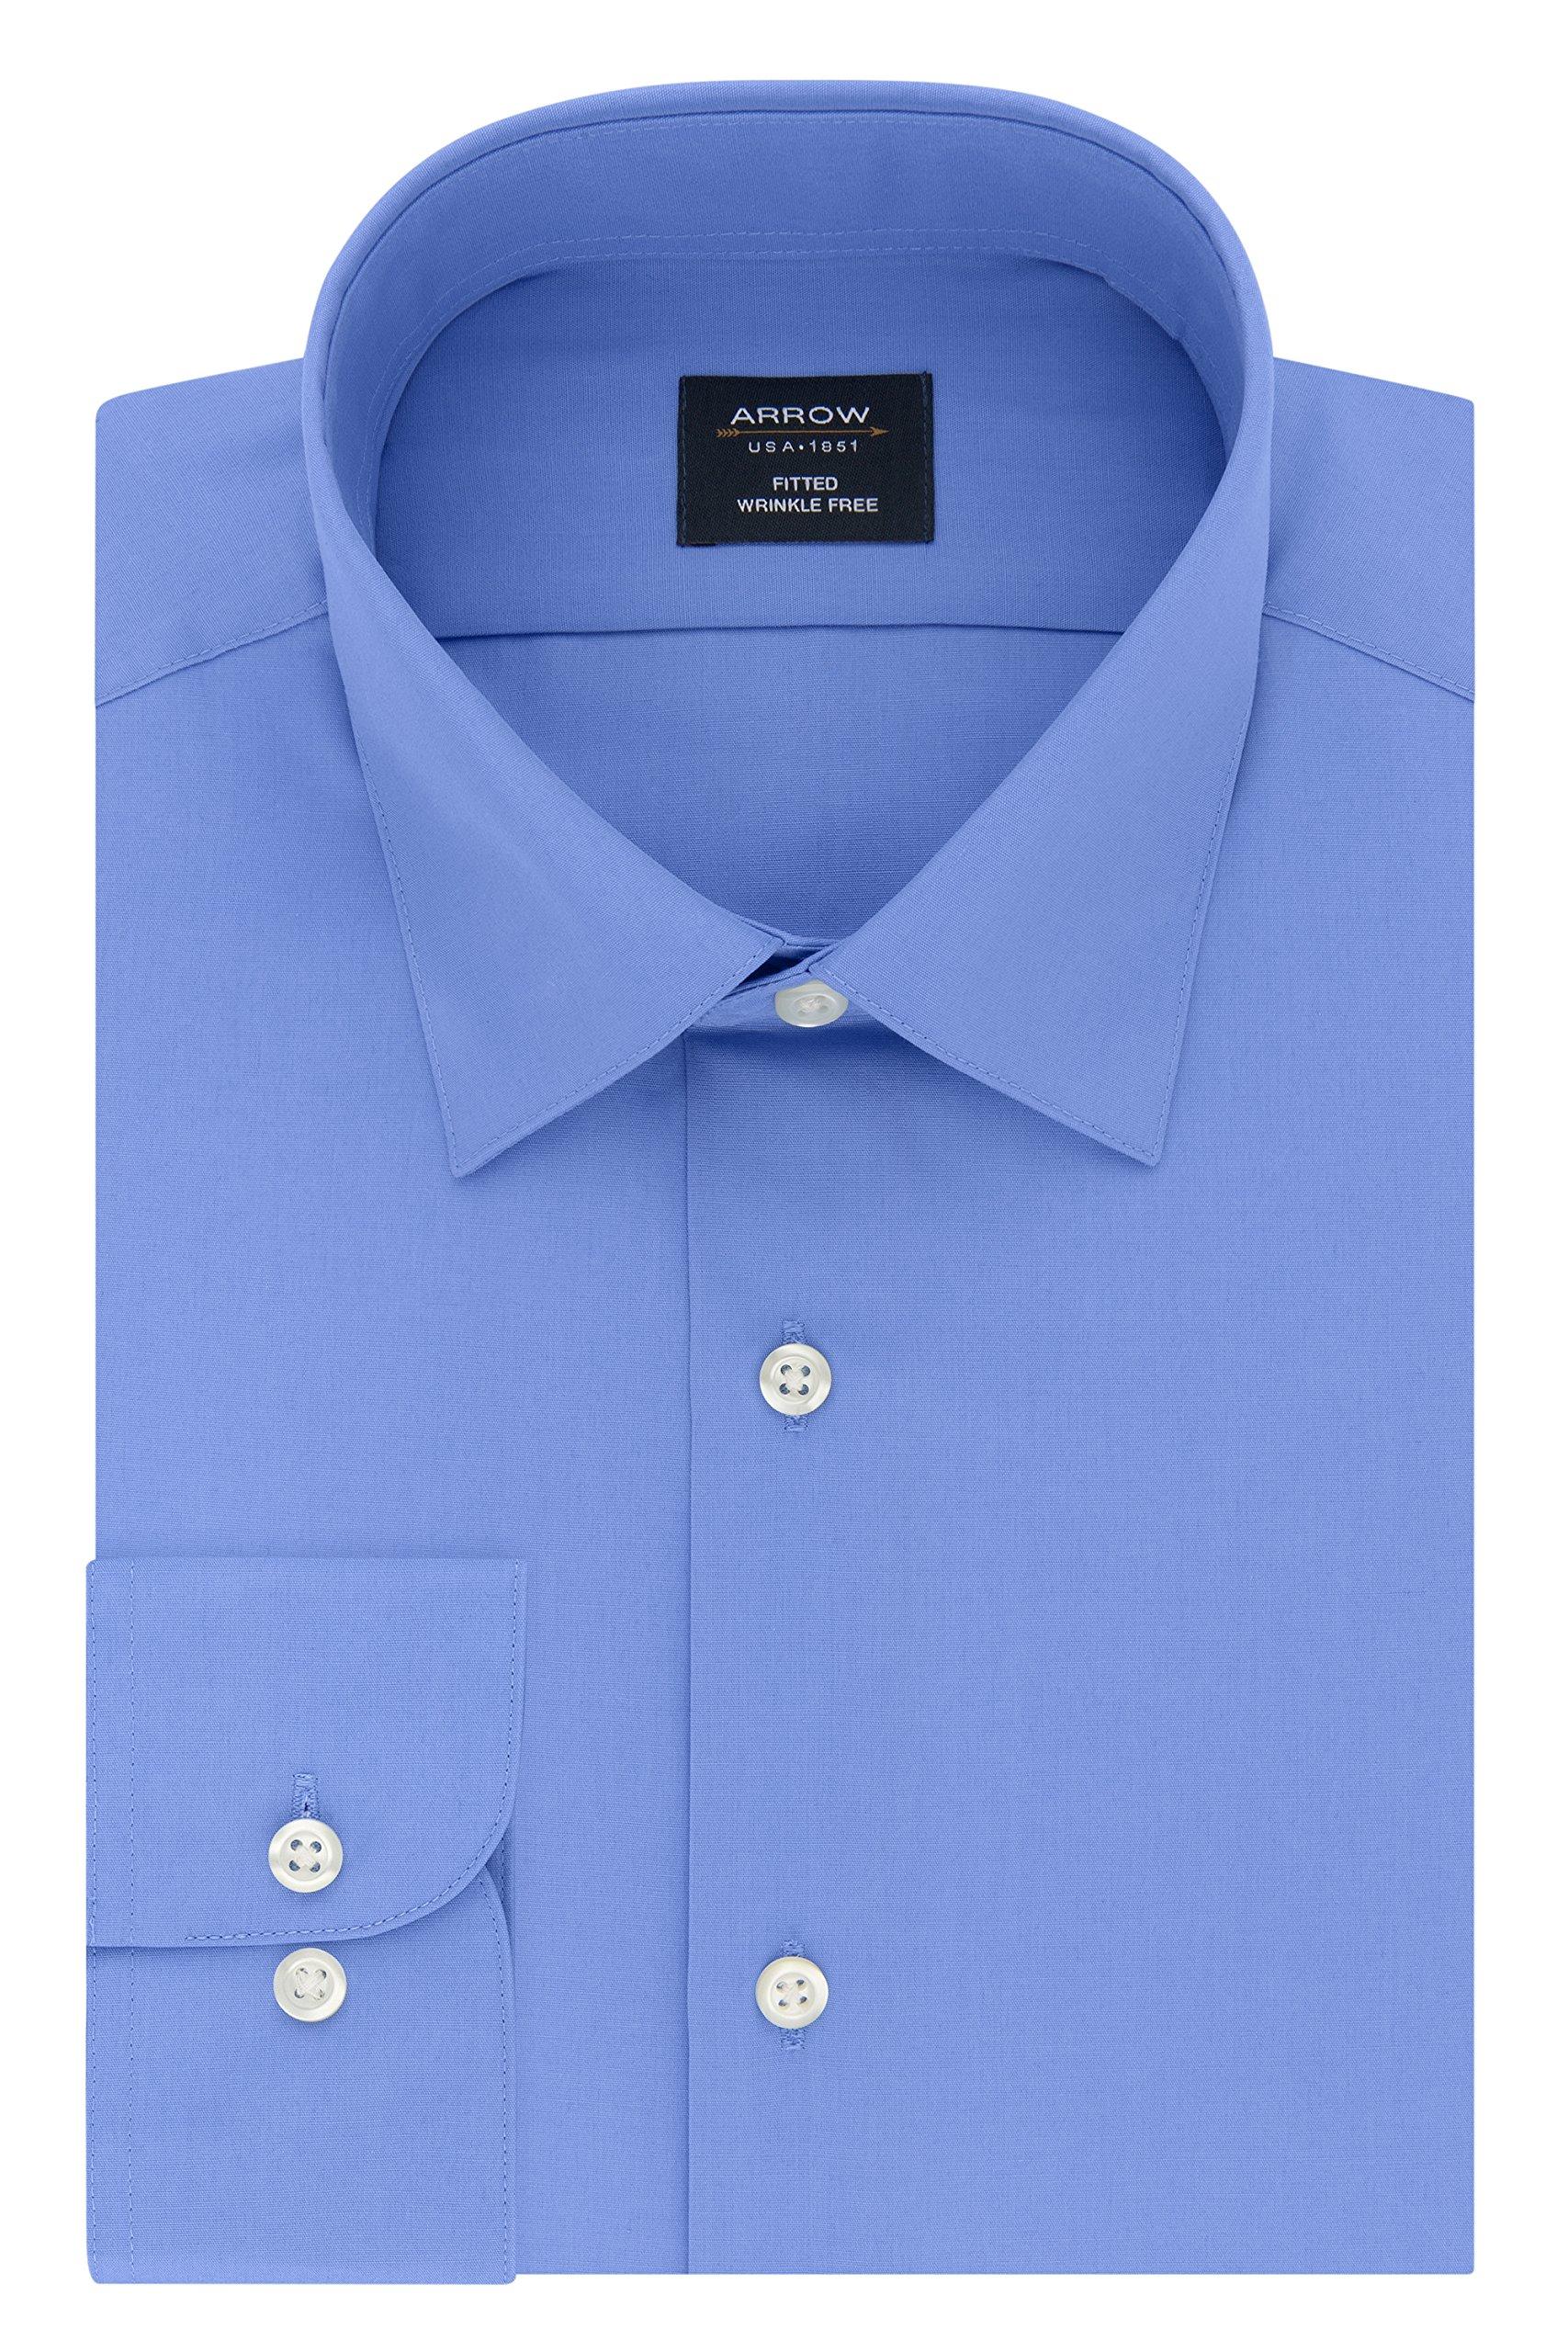 Arrow Men's Dress Shirt Poplin Fitted Spread Collar, Corn Flower, 15-15.5'' Neck 34-35'' Sleeve